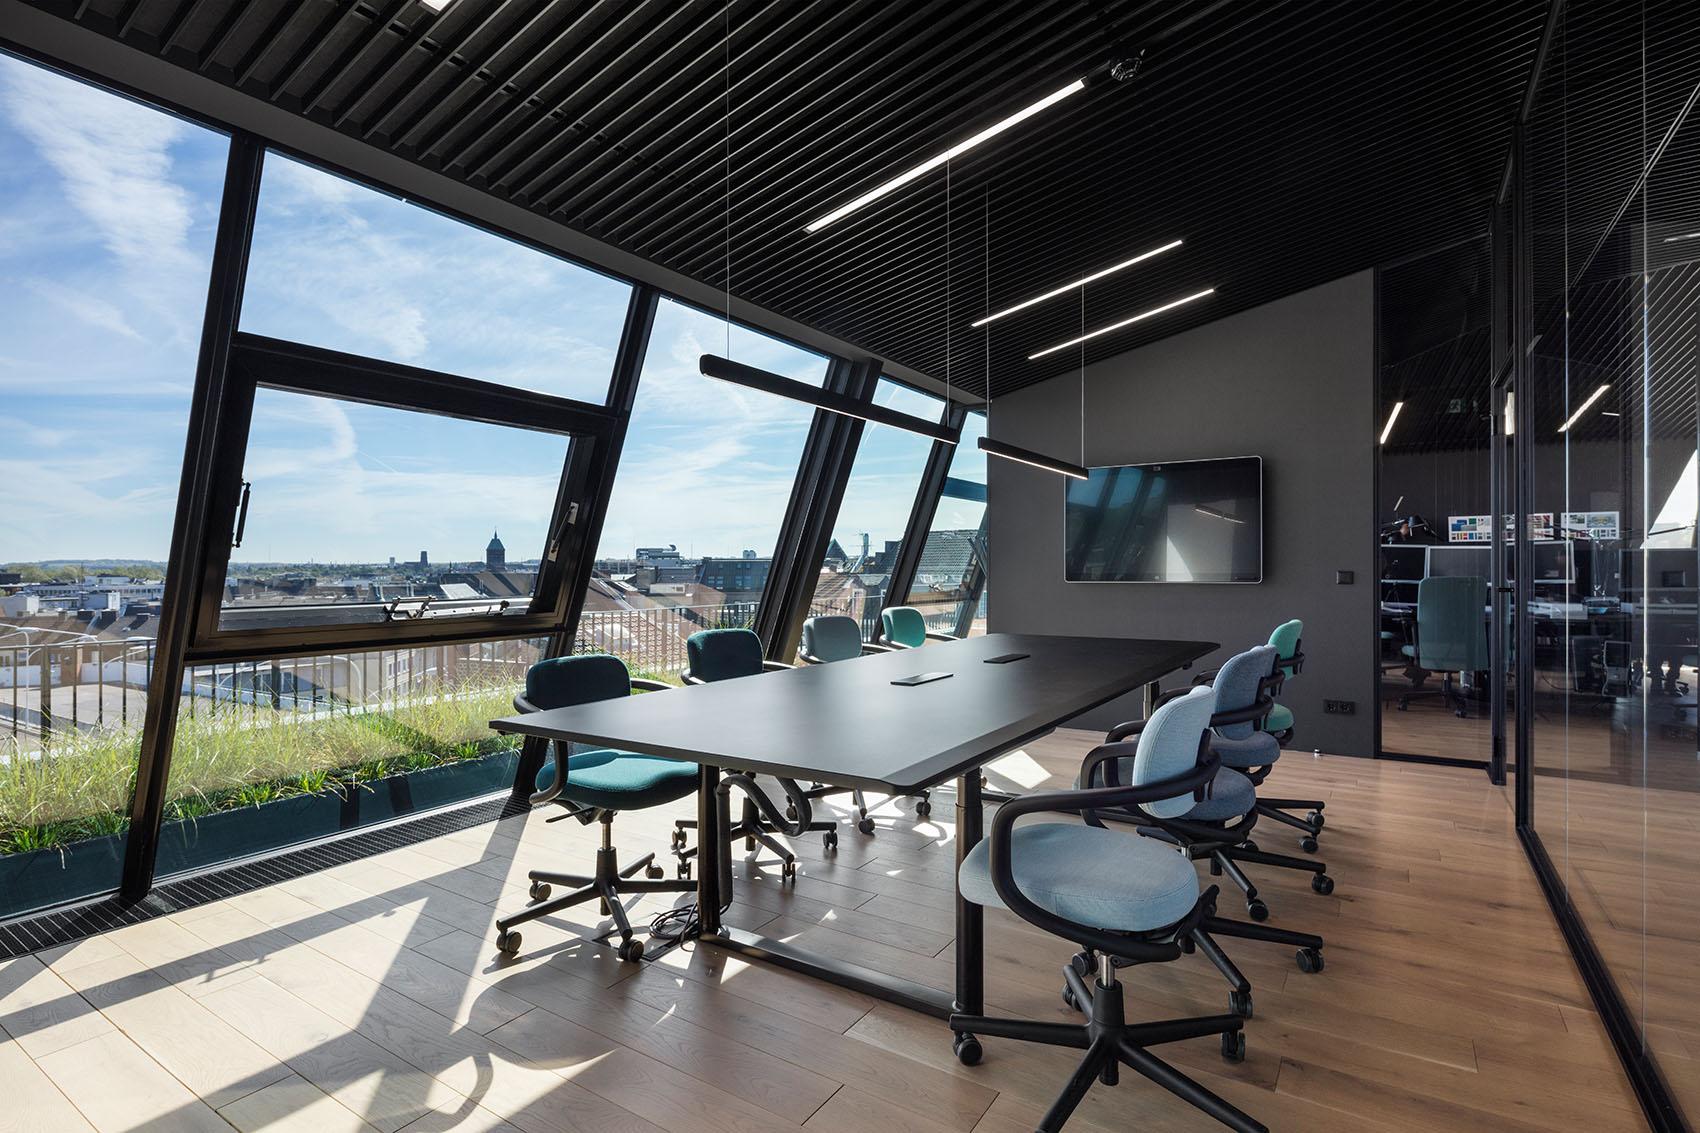 8_1_Rooftop-Office-Aachen_CROSS-Architecture.jpg